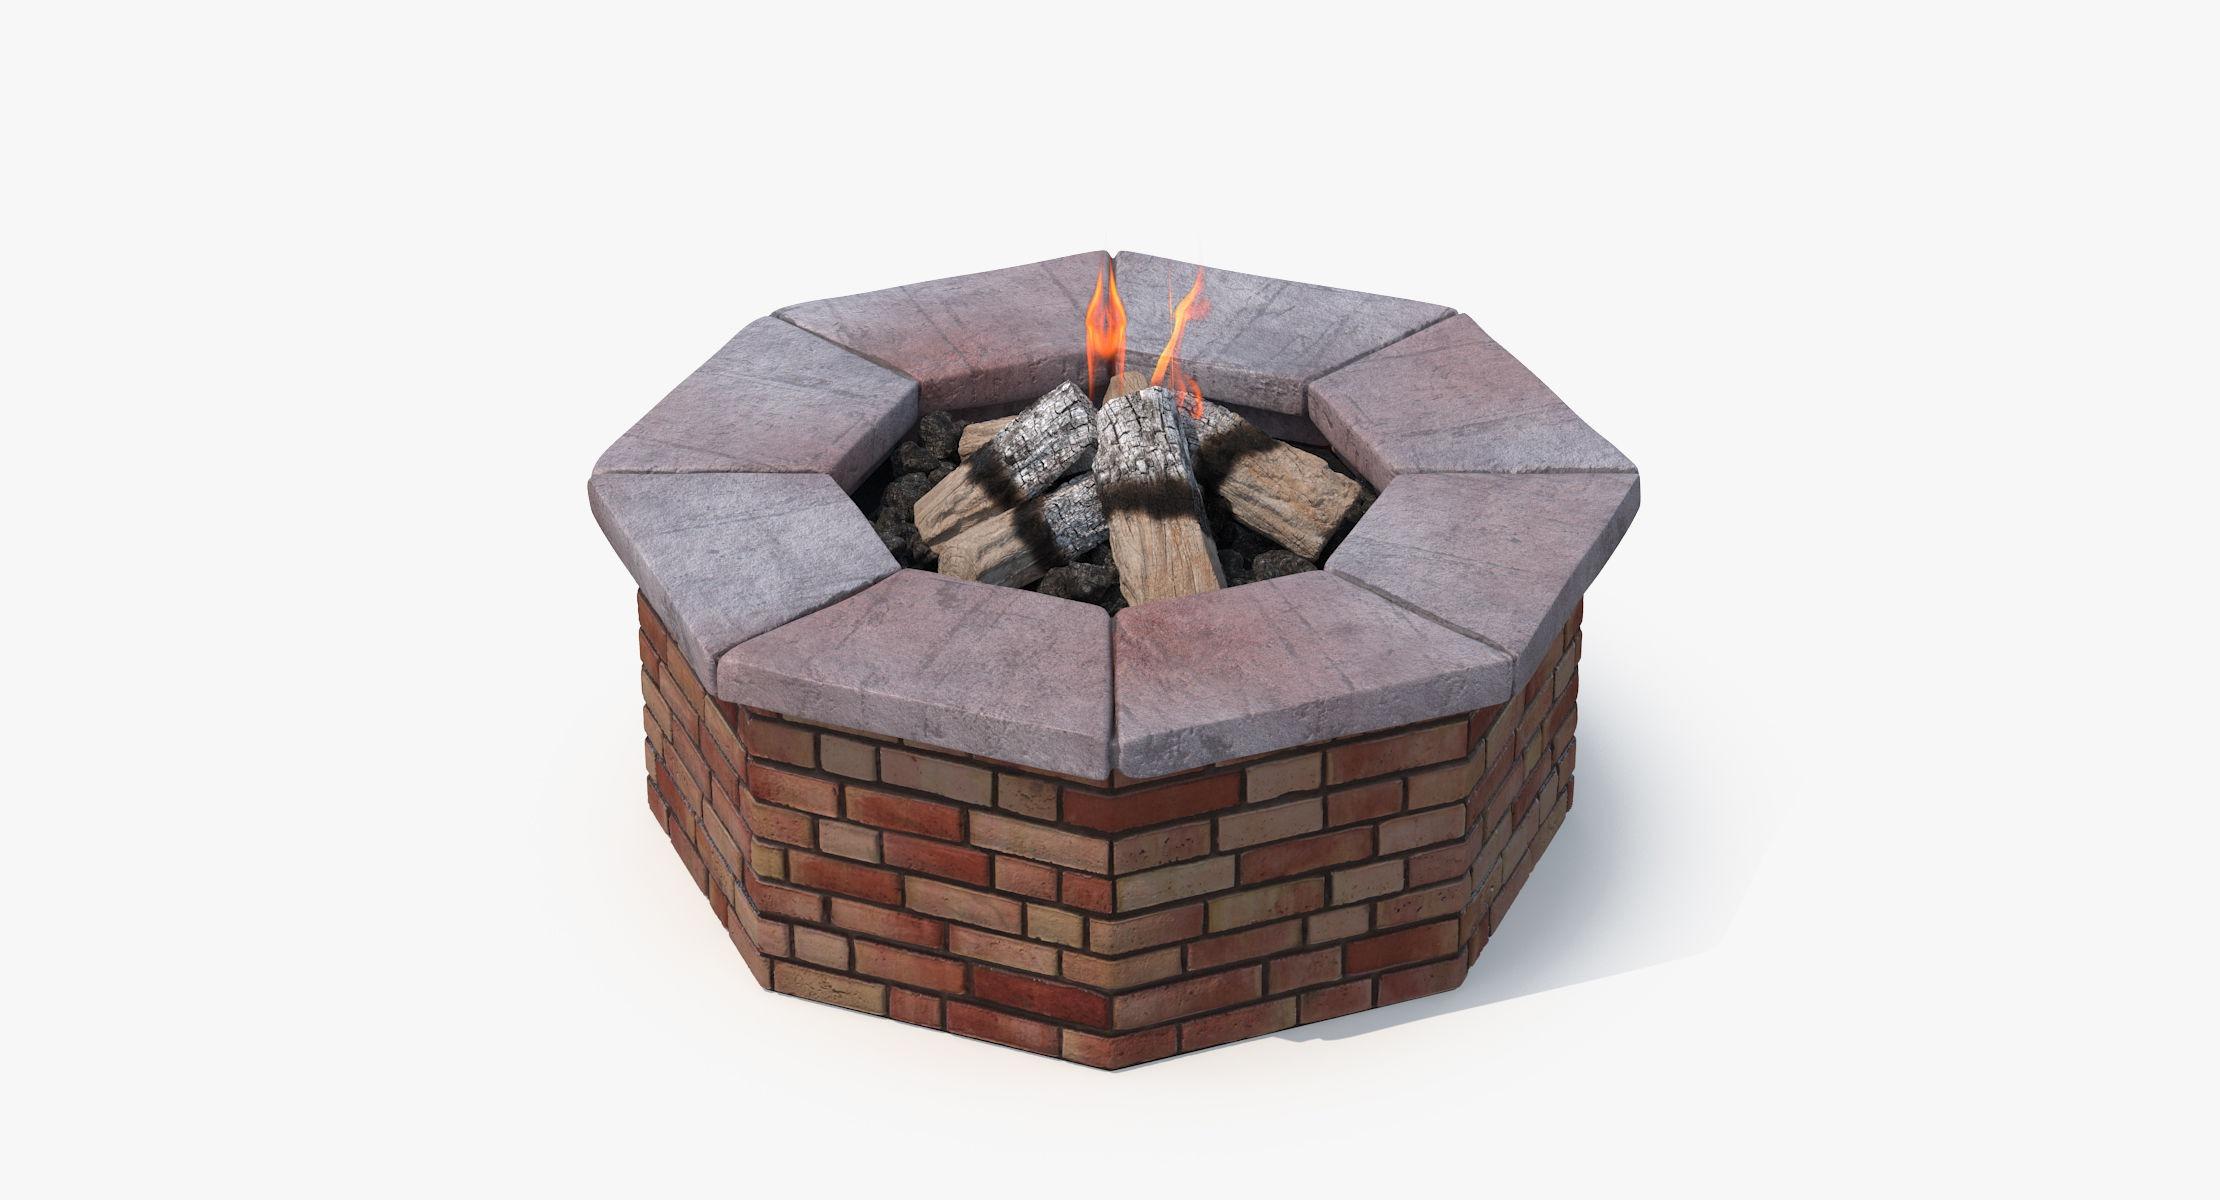 Brick Fire Pit - reel 1